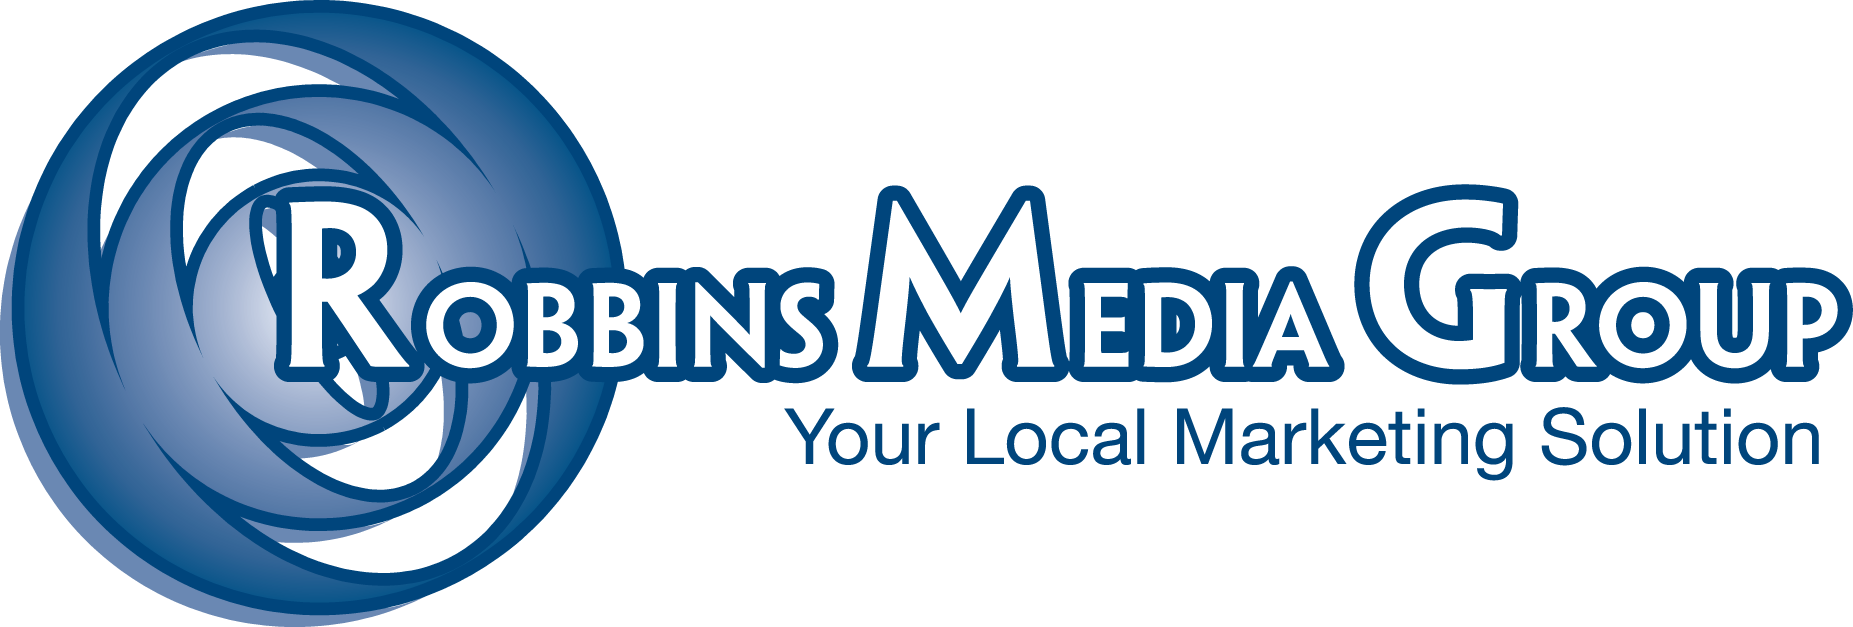 Robbins Media Group LLC